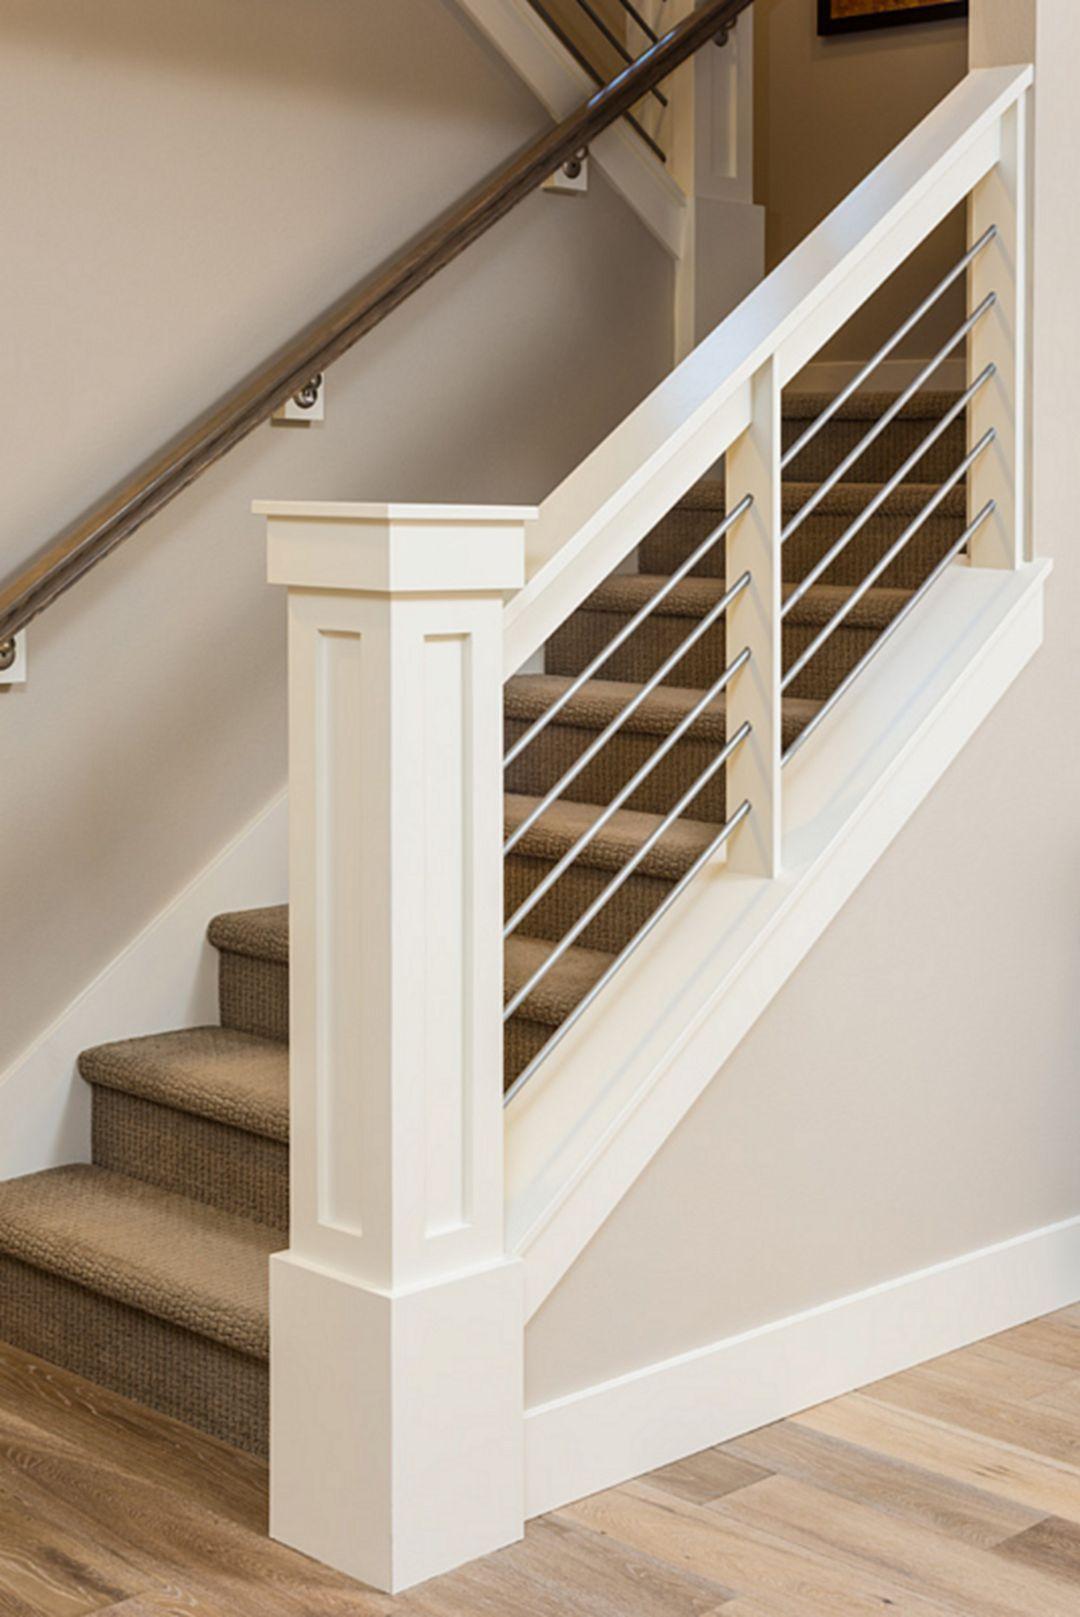 30 New Modern Staircase Ideas For Wonderful Home Stair Railing Design House Stairs Modern Stair Railing